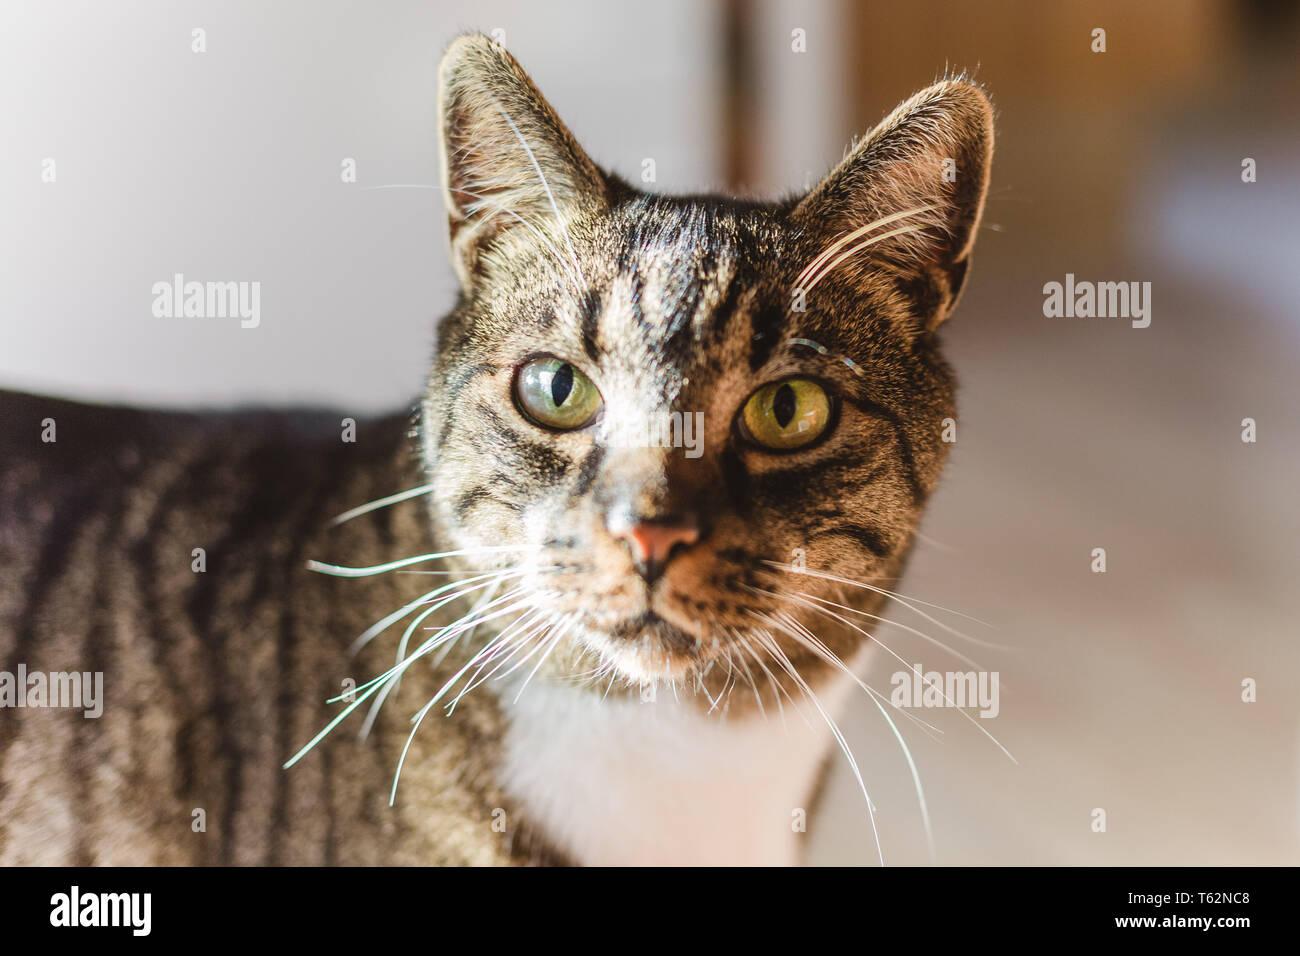 Haustier Katze Kater Augen offen wachsam gestreift / cat male, eyes open, striped, pet Stock Photo